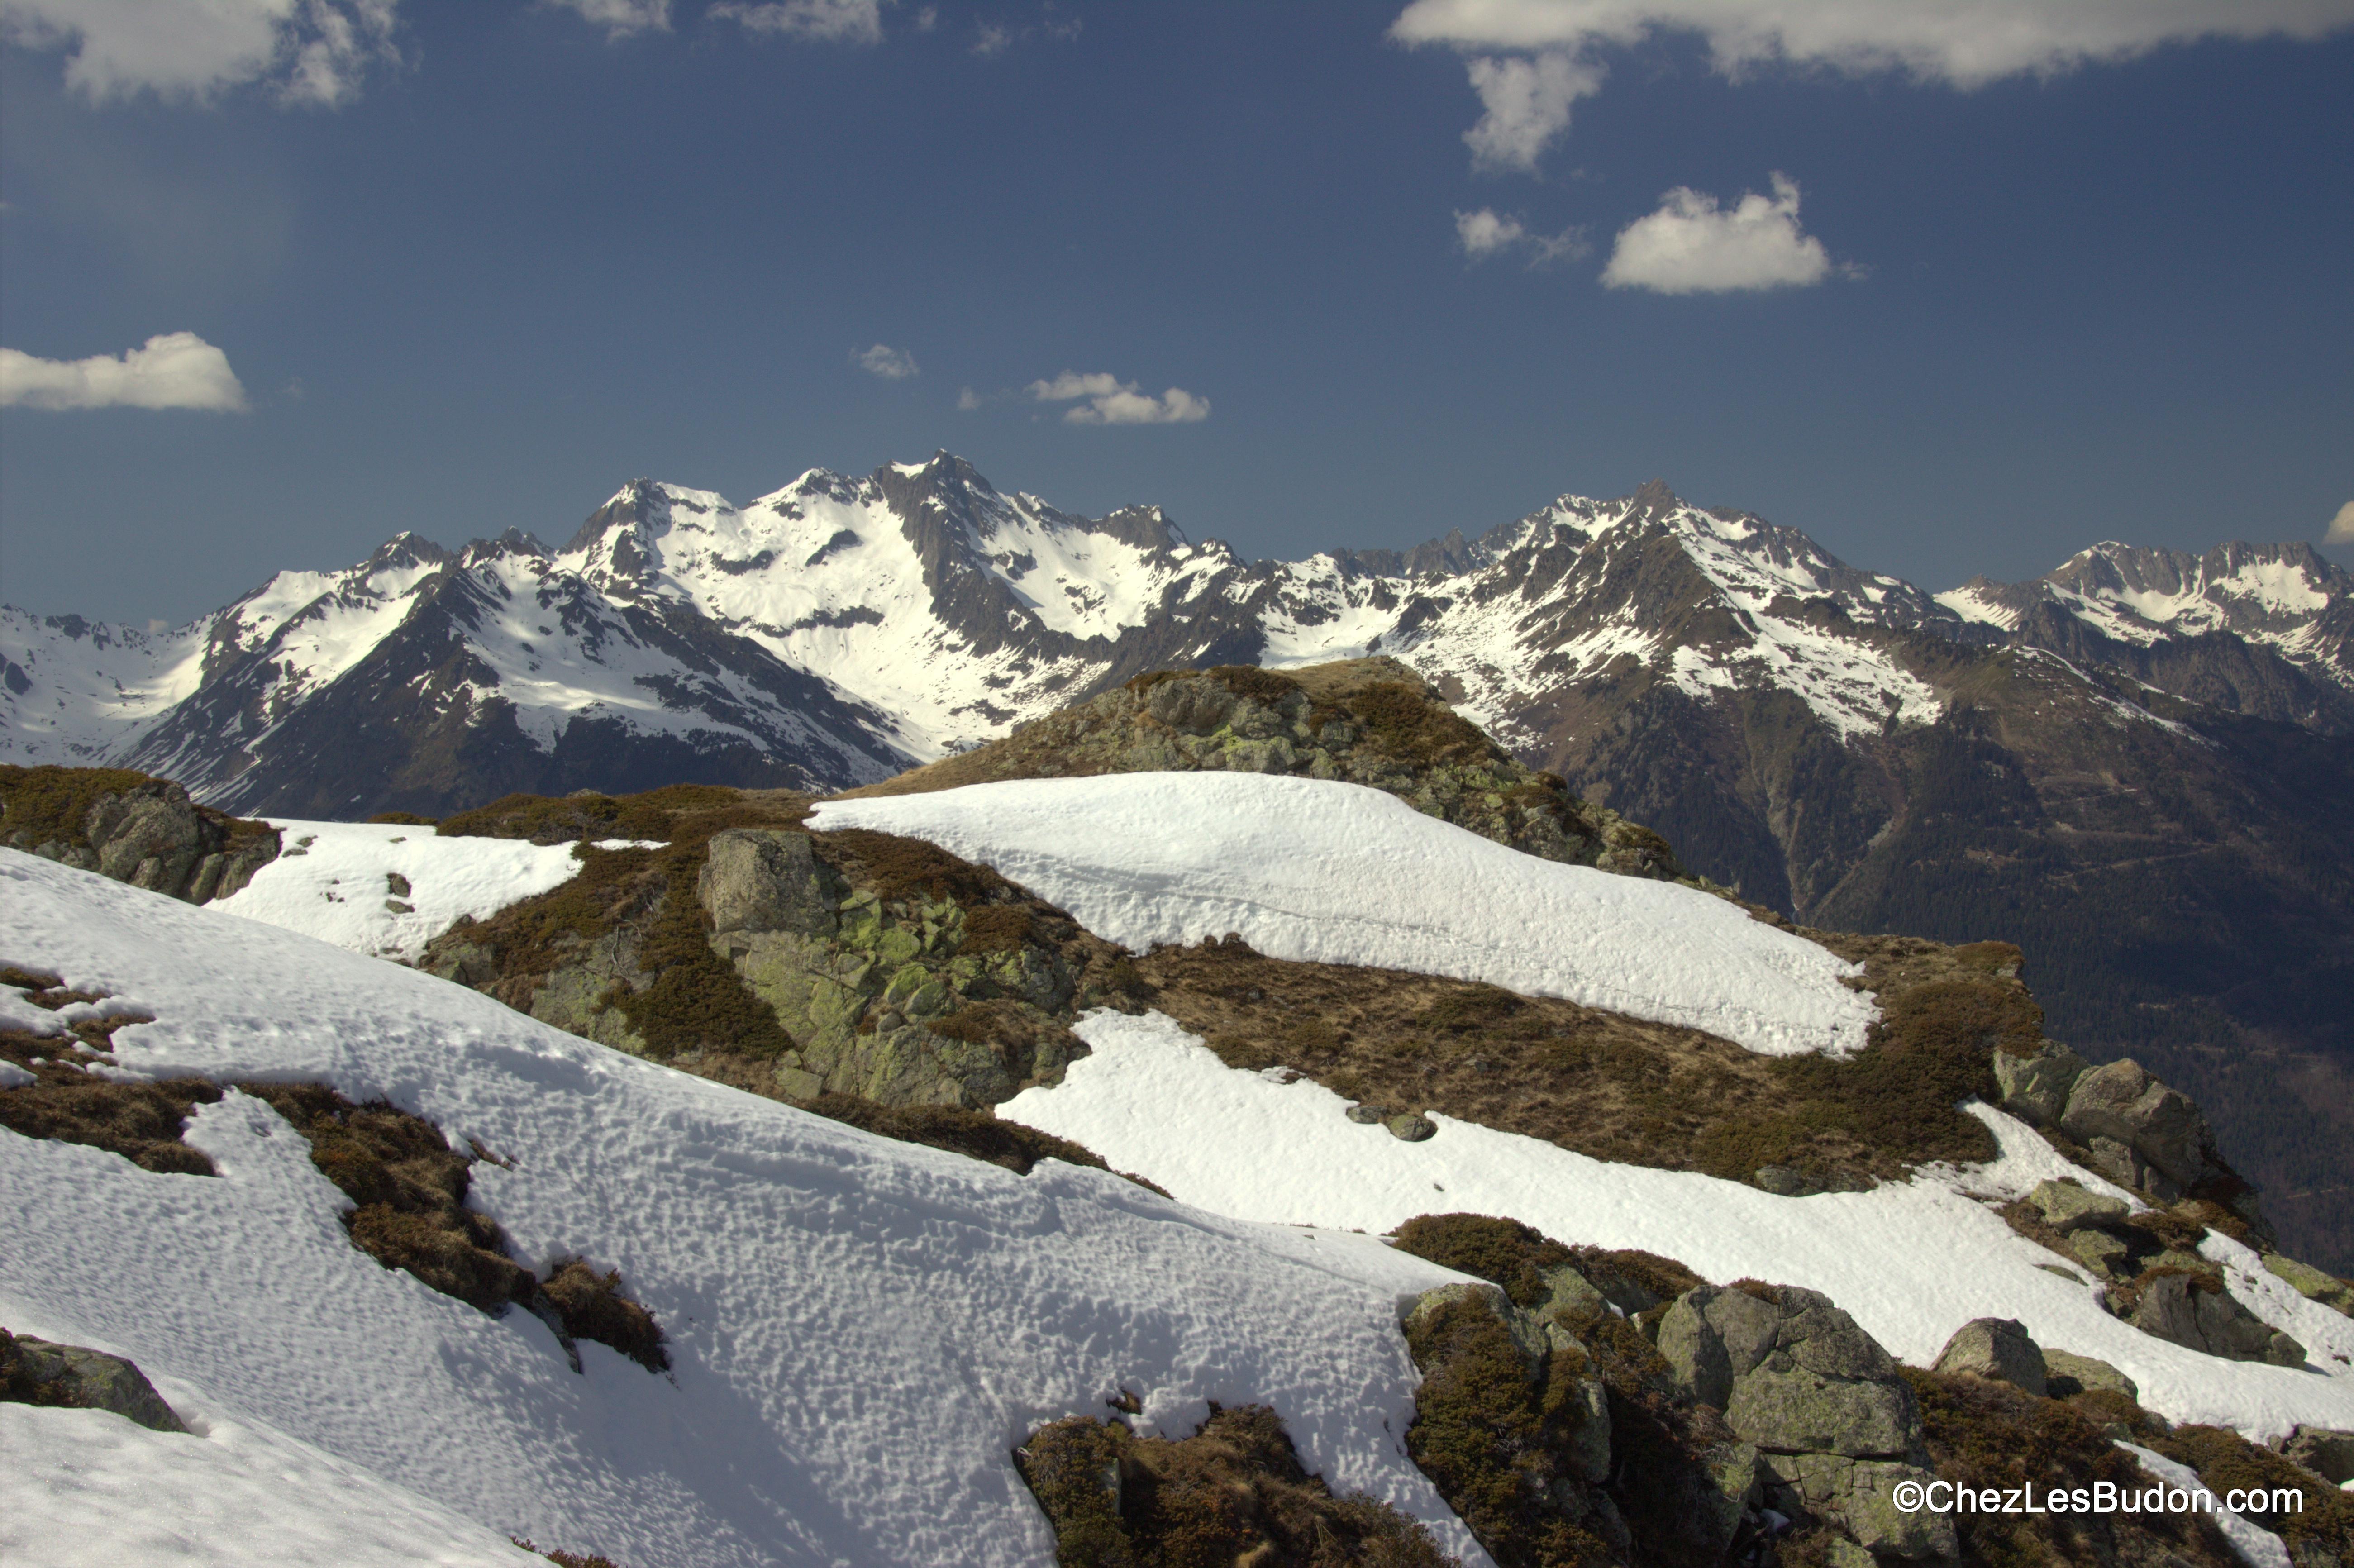 Le Grand Châtelard (2143m)